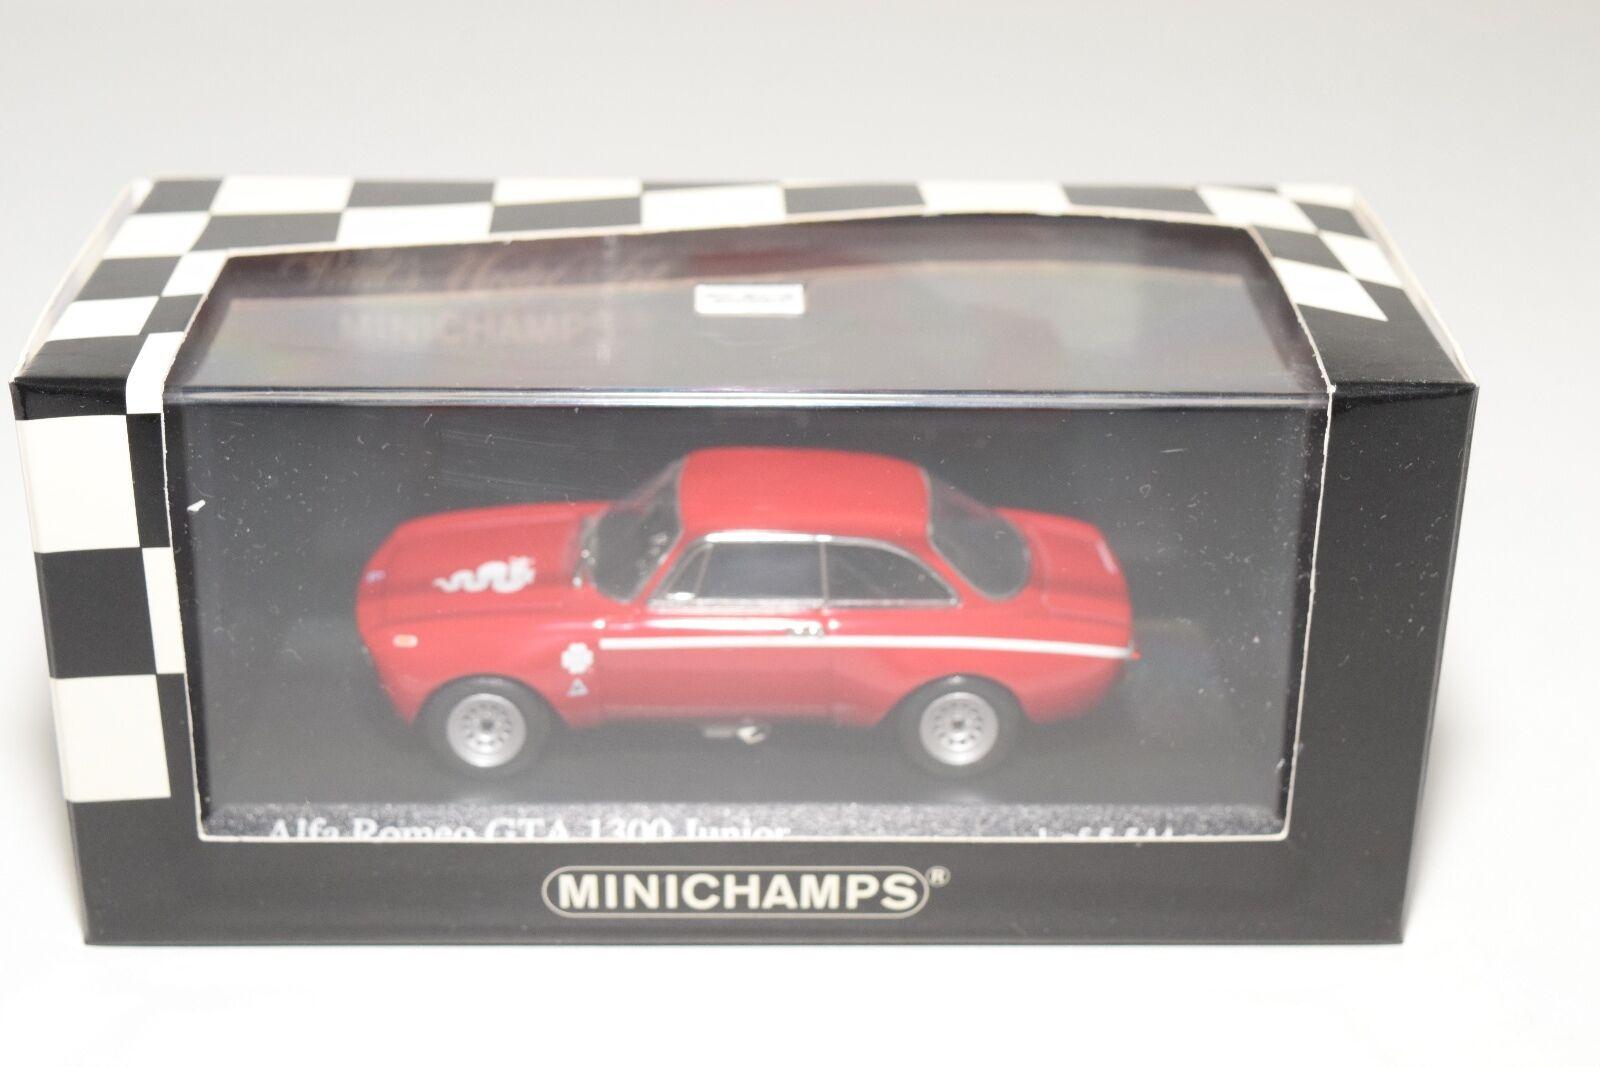 MINICHAMPS ALFA ROMEO GTA 1300 JUNIOR Rojo MINT BOXED